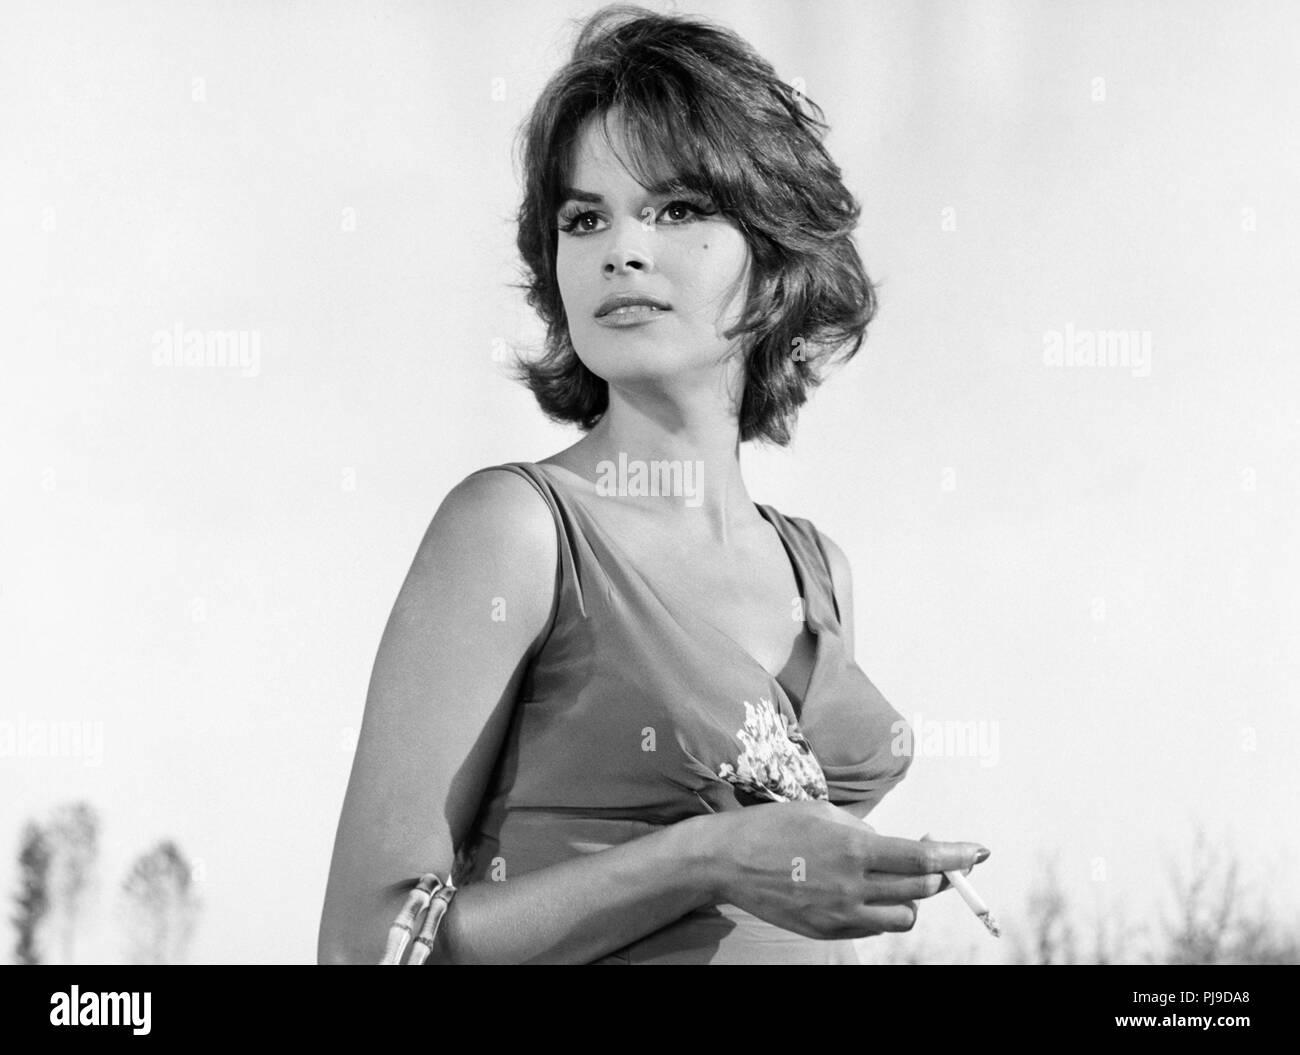 anna maria ferrero, bad girls don't cry, 1959 - Stock Image